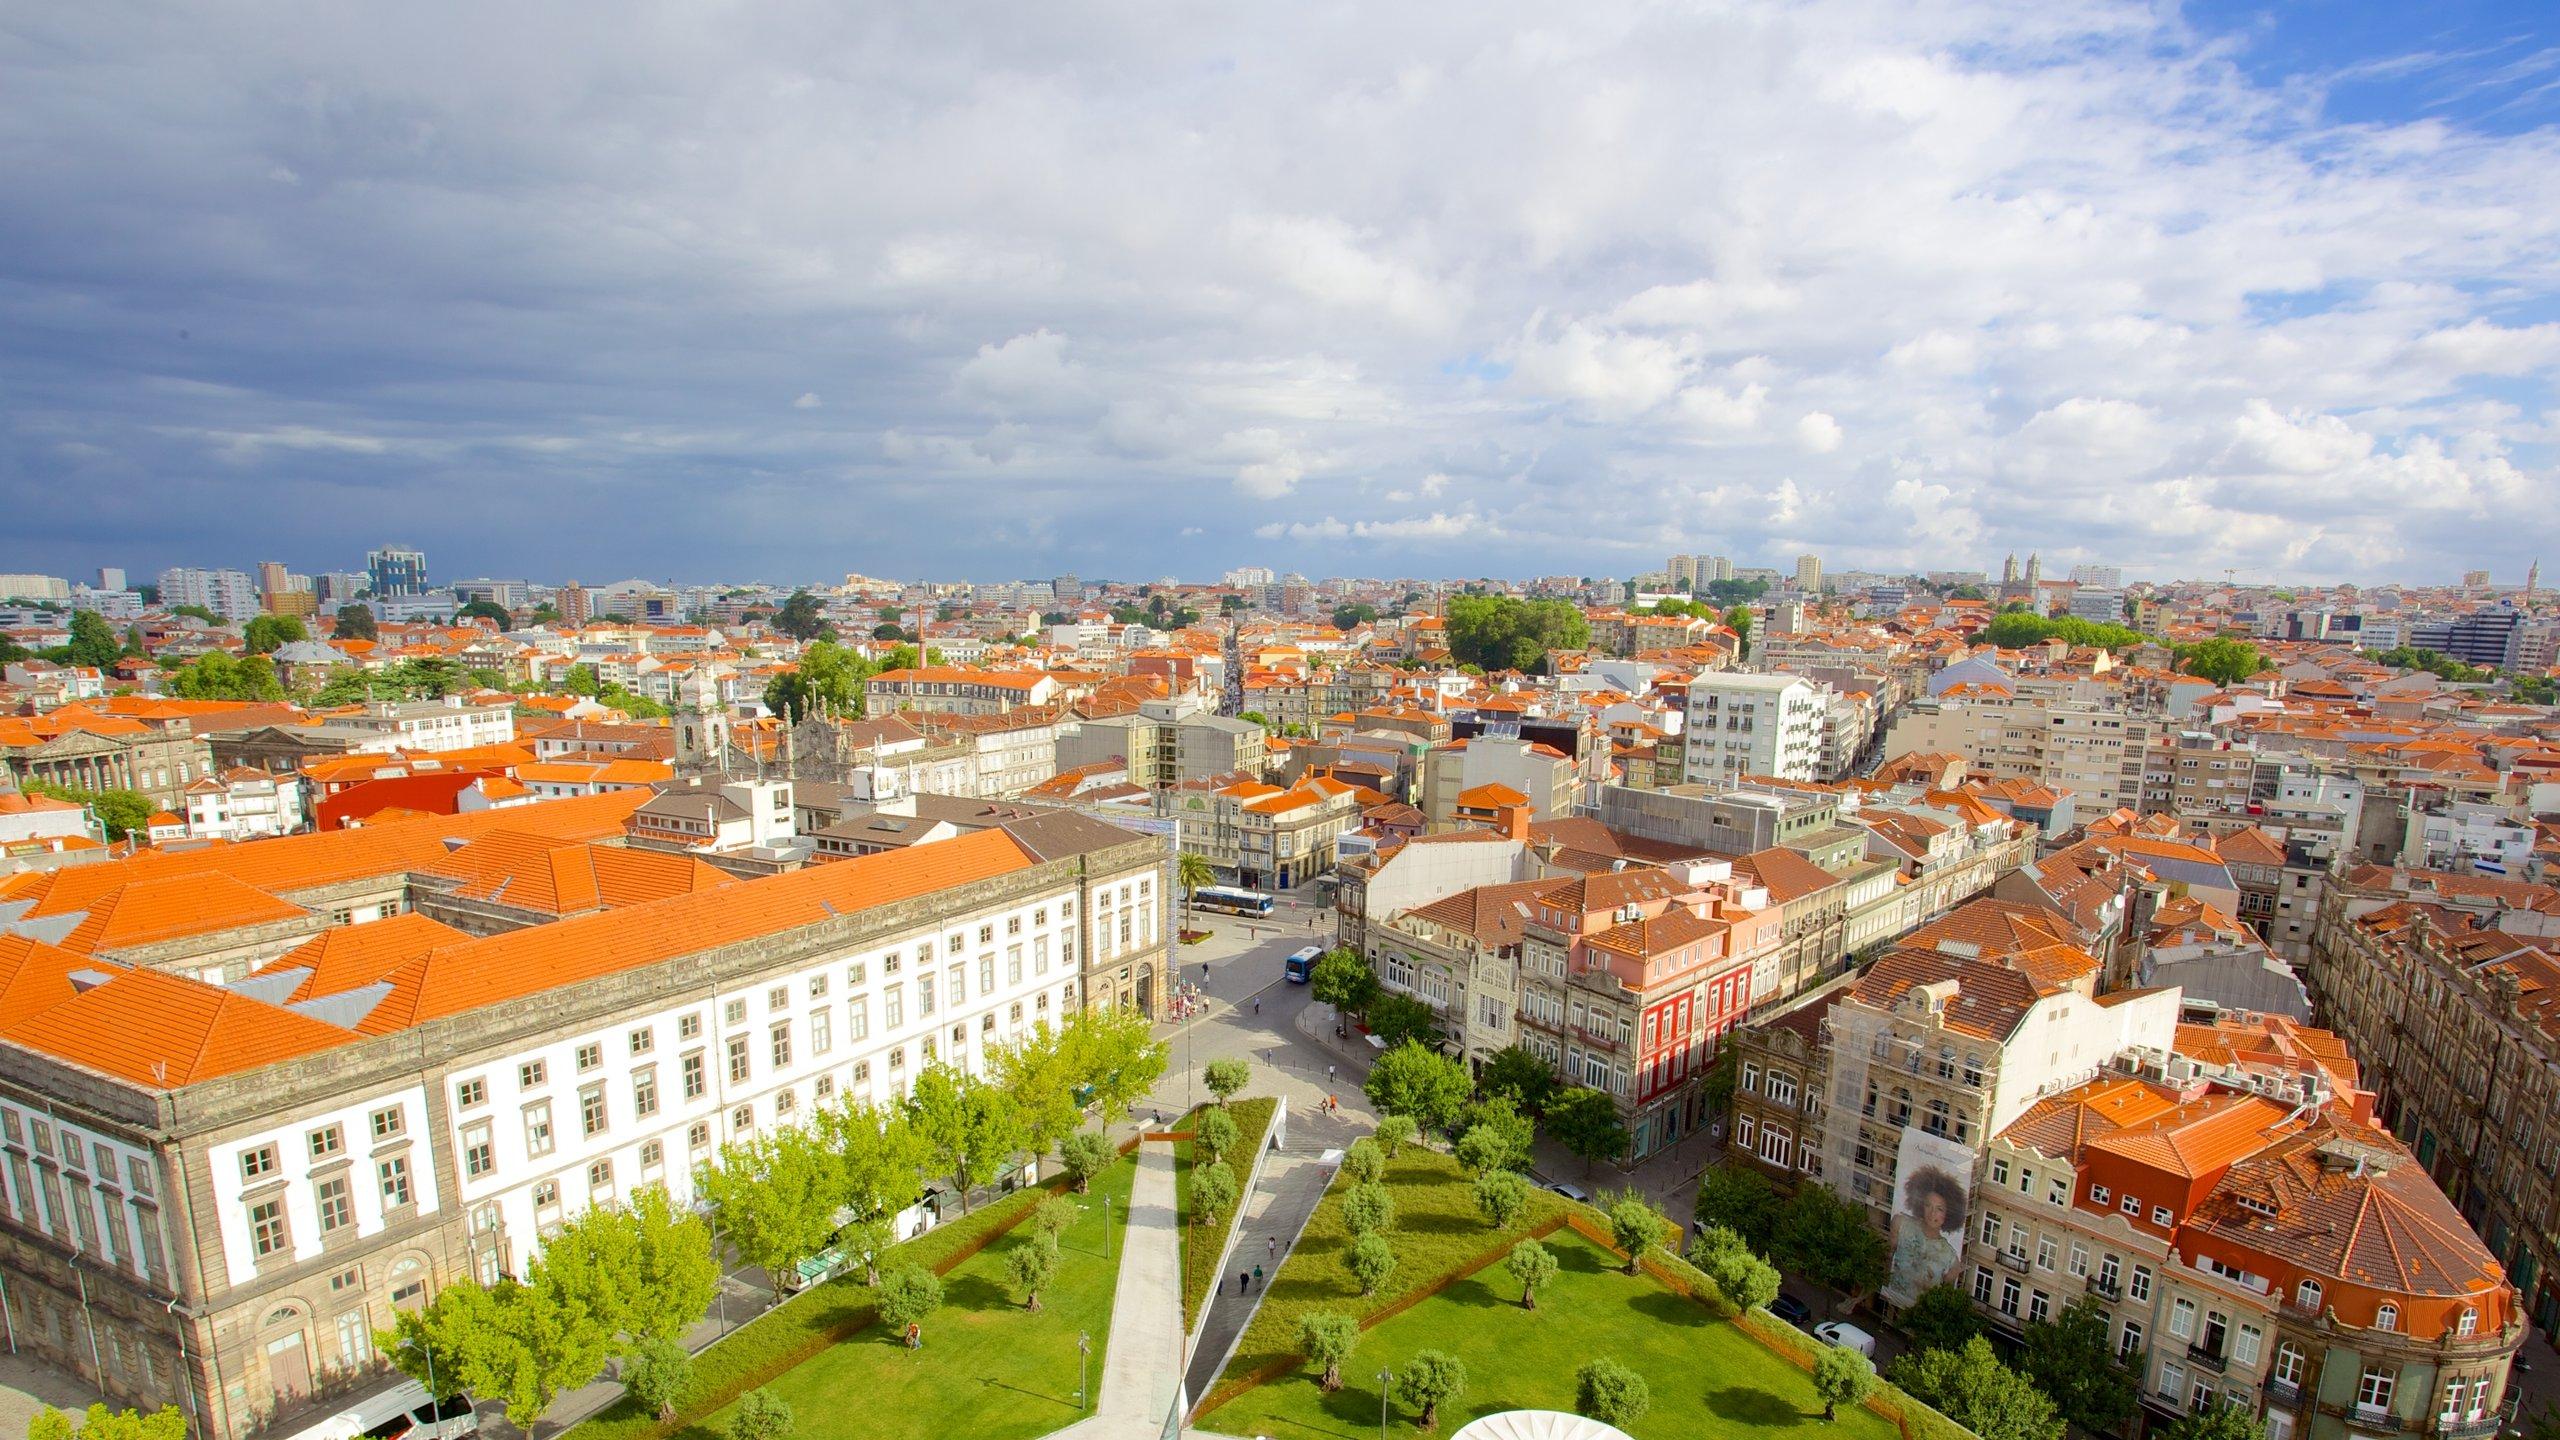 Centro / Baixa, Porto, Porto Bezirk, Portugal